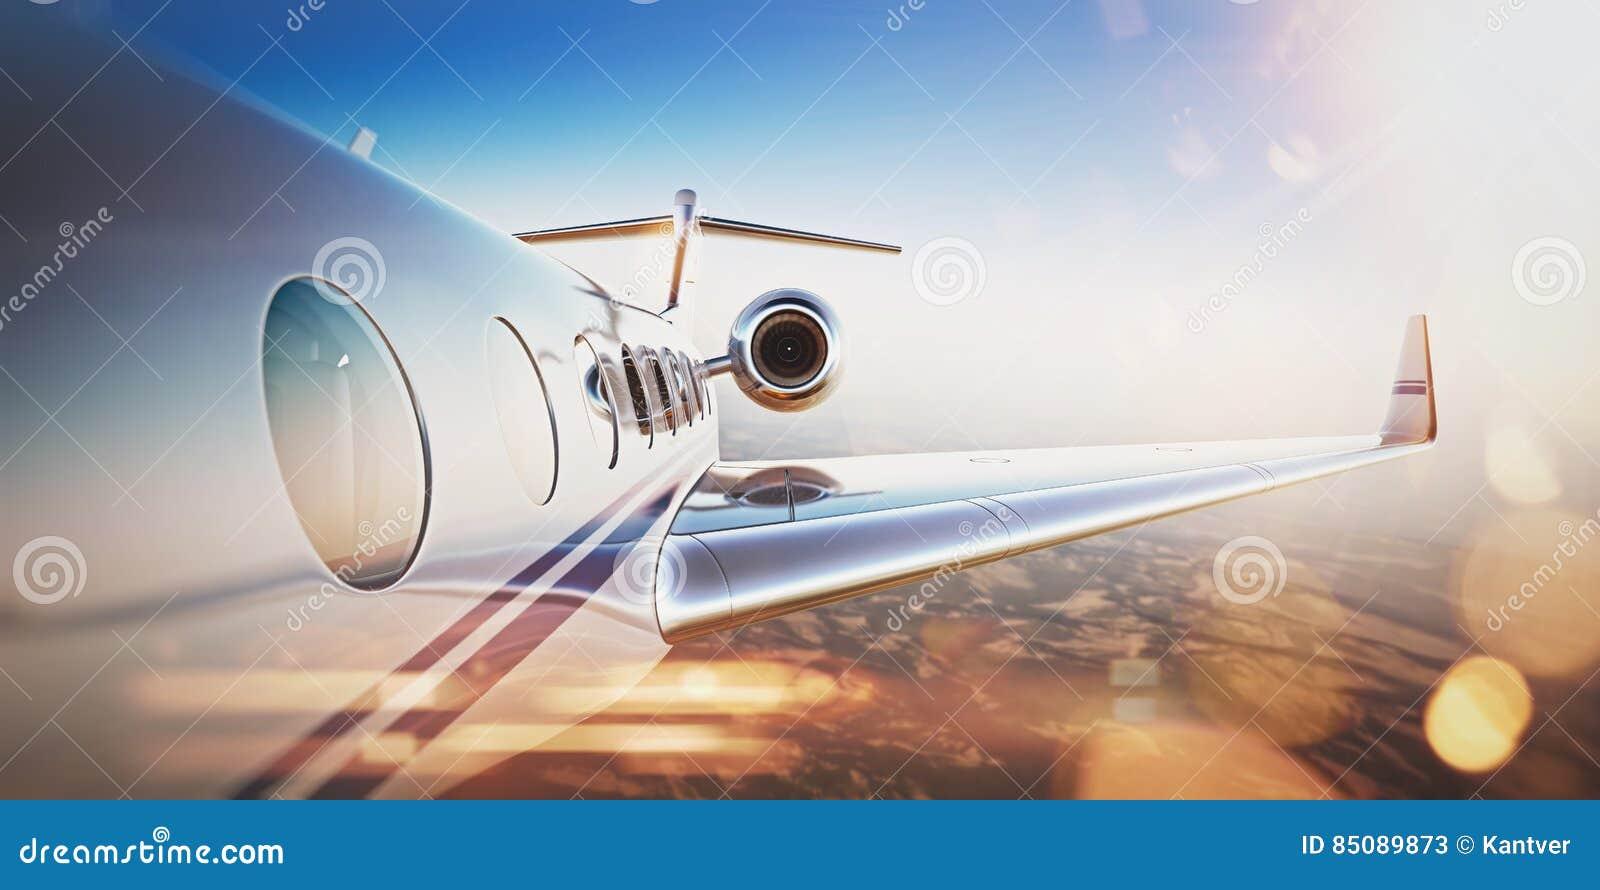 Business travel concept.Generic design of white luxury private jet flying in blue sky at sunset.Uninhabited desert